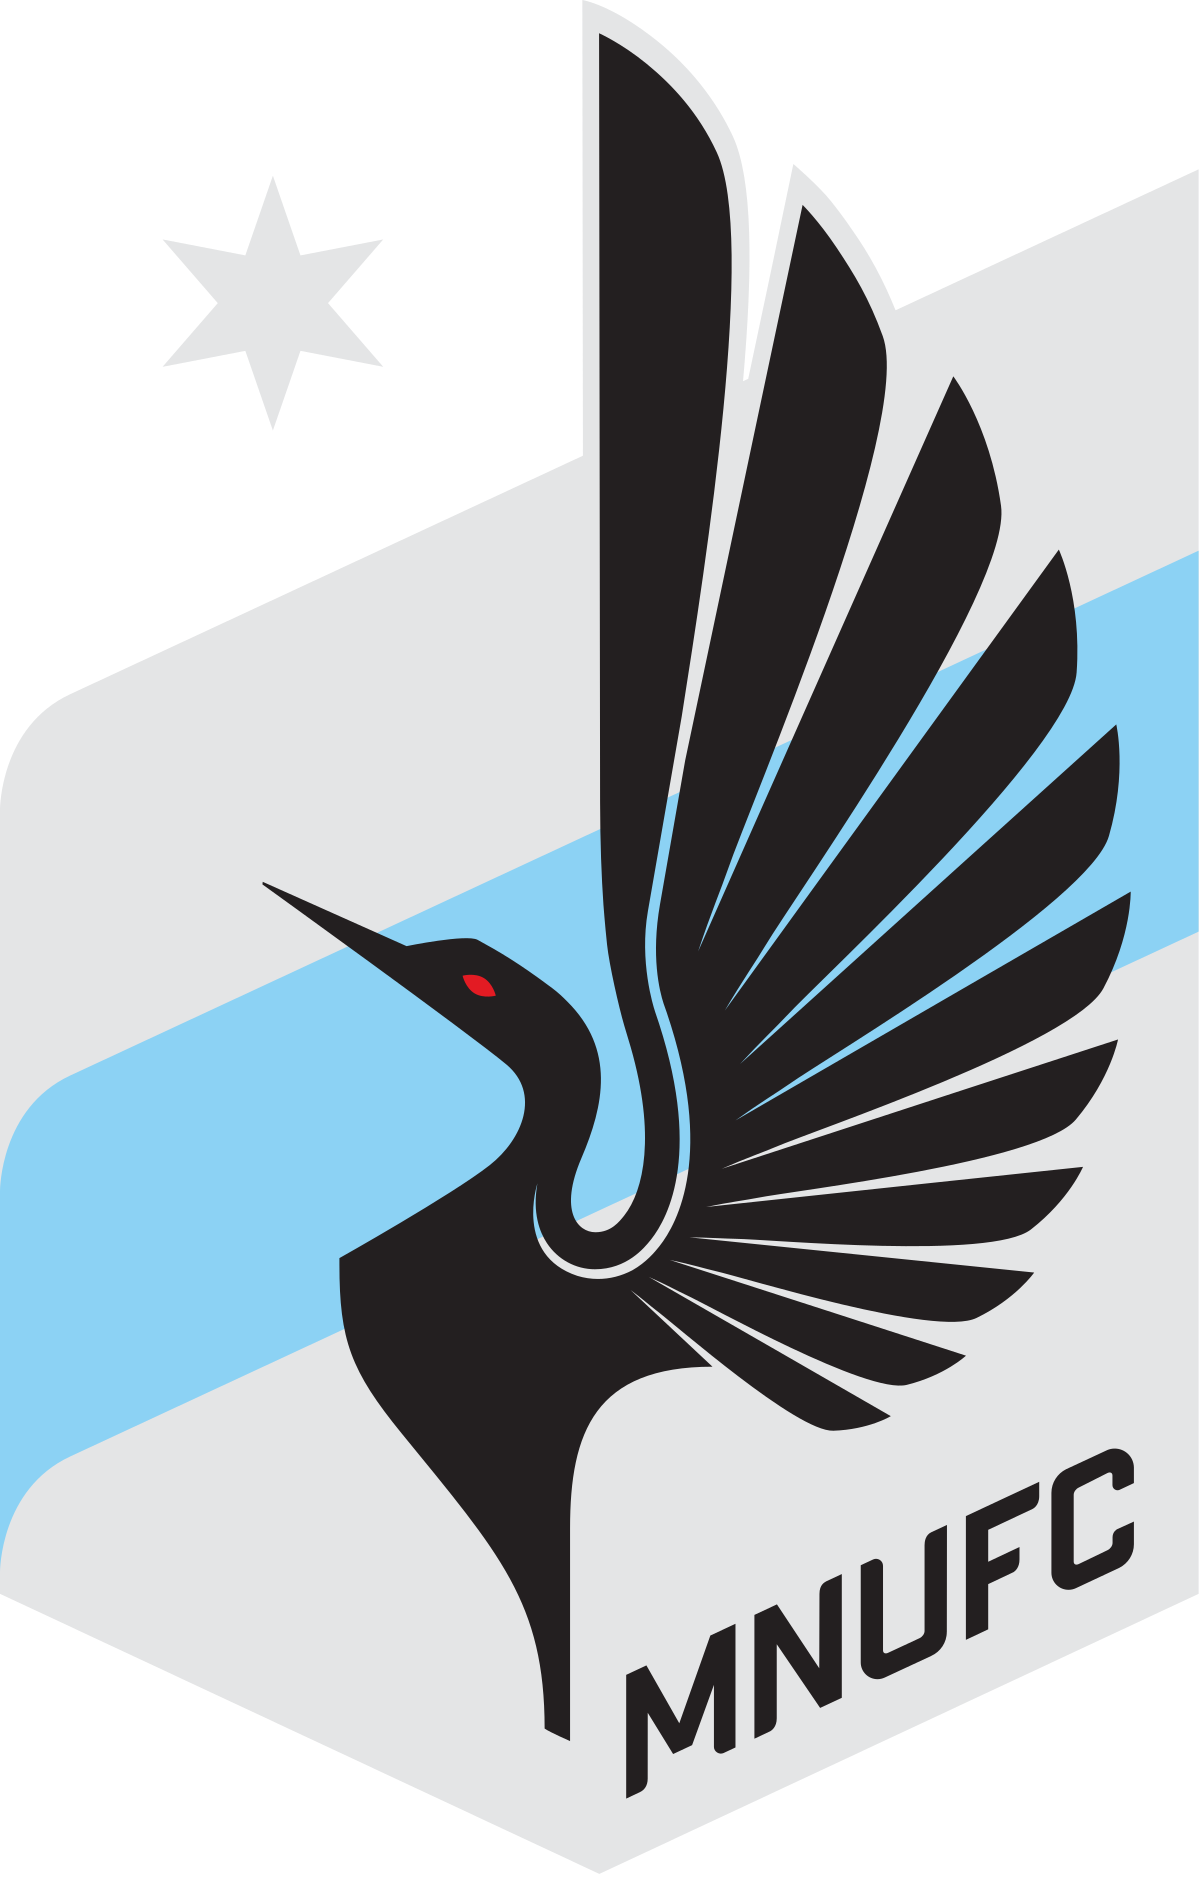 MN United Logo